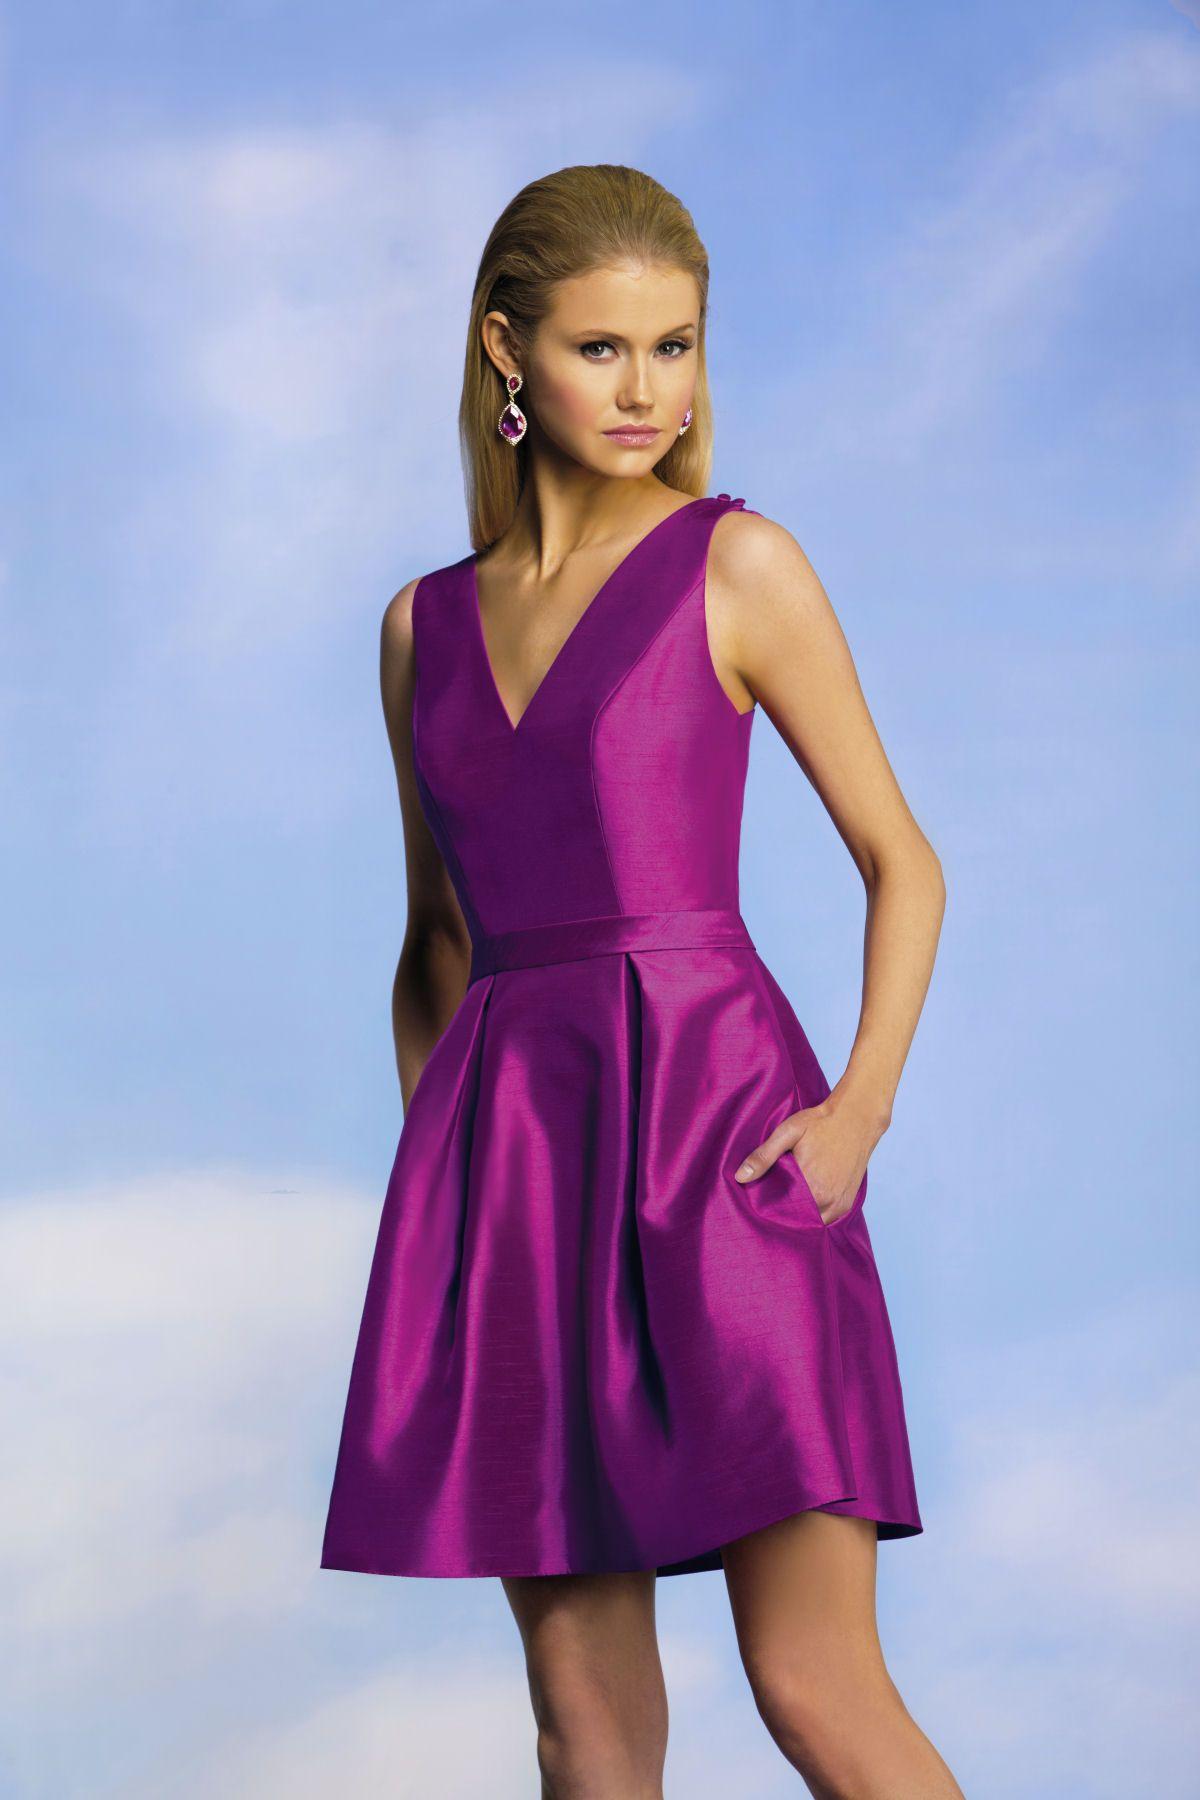 Plus Size Bridesmaid Dresses: 29 Gorgeous Styles | Forma, Boda y ...